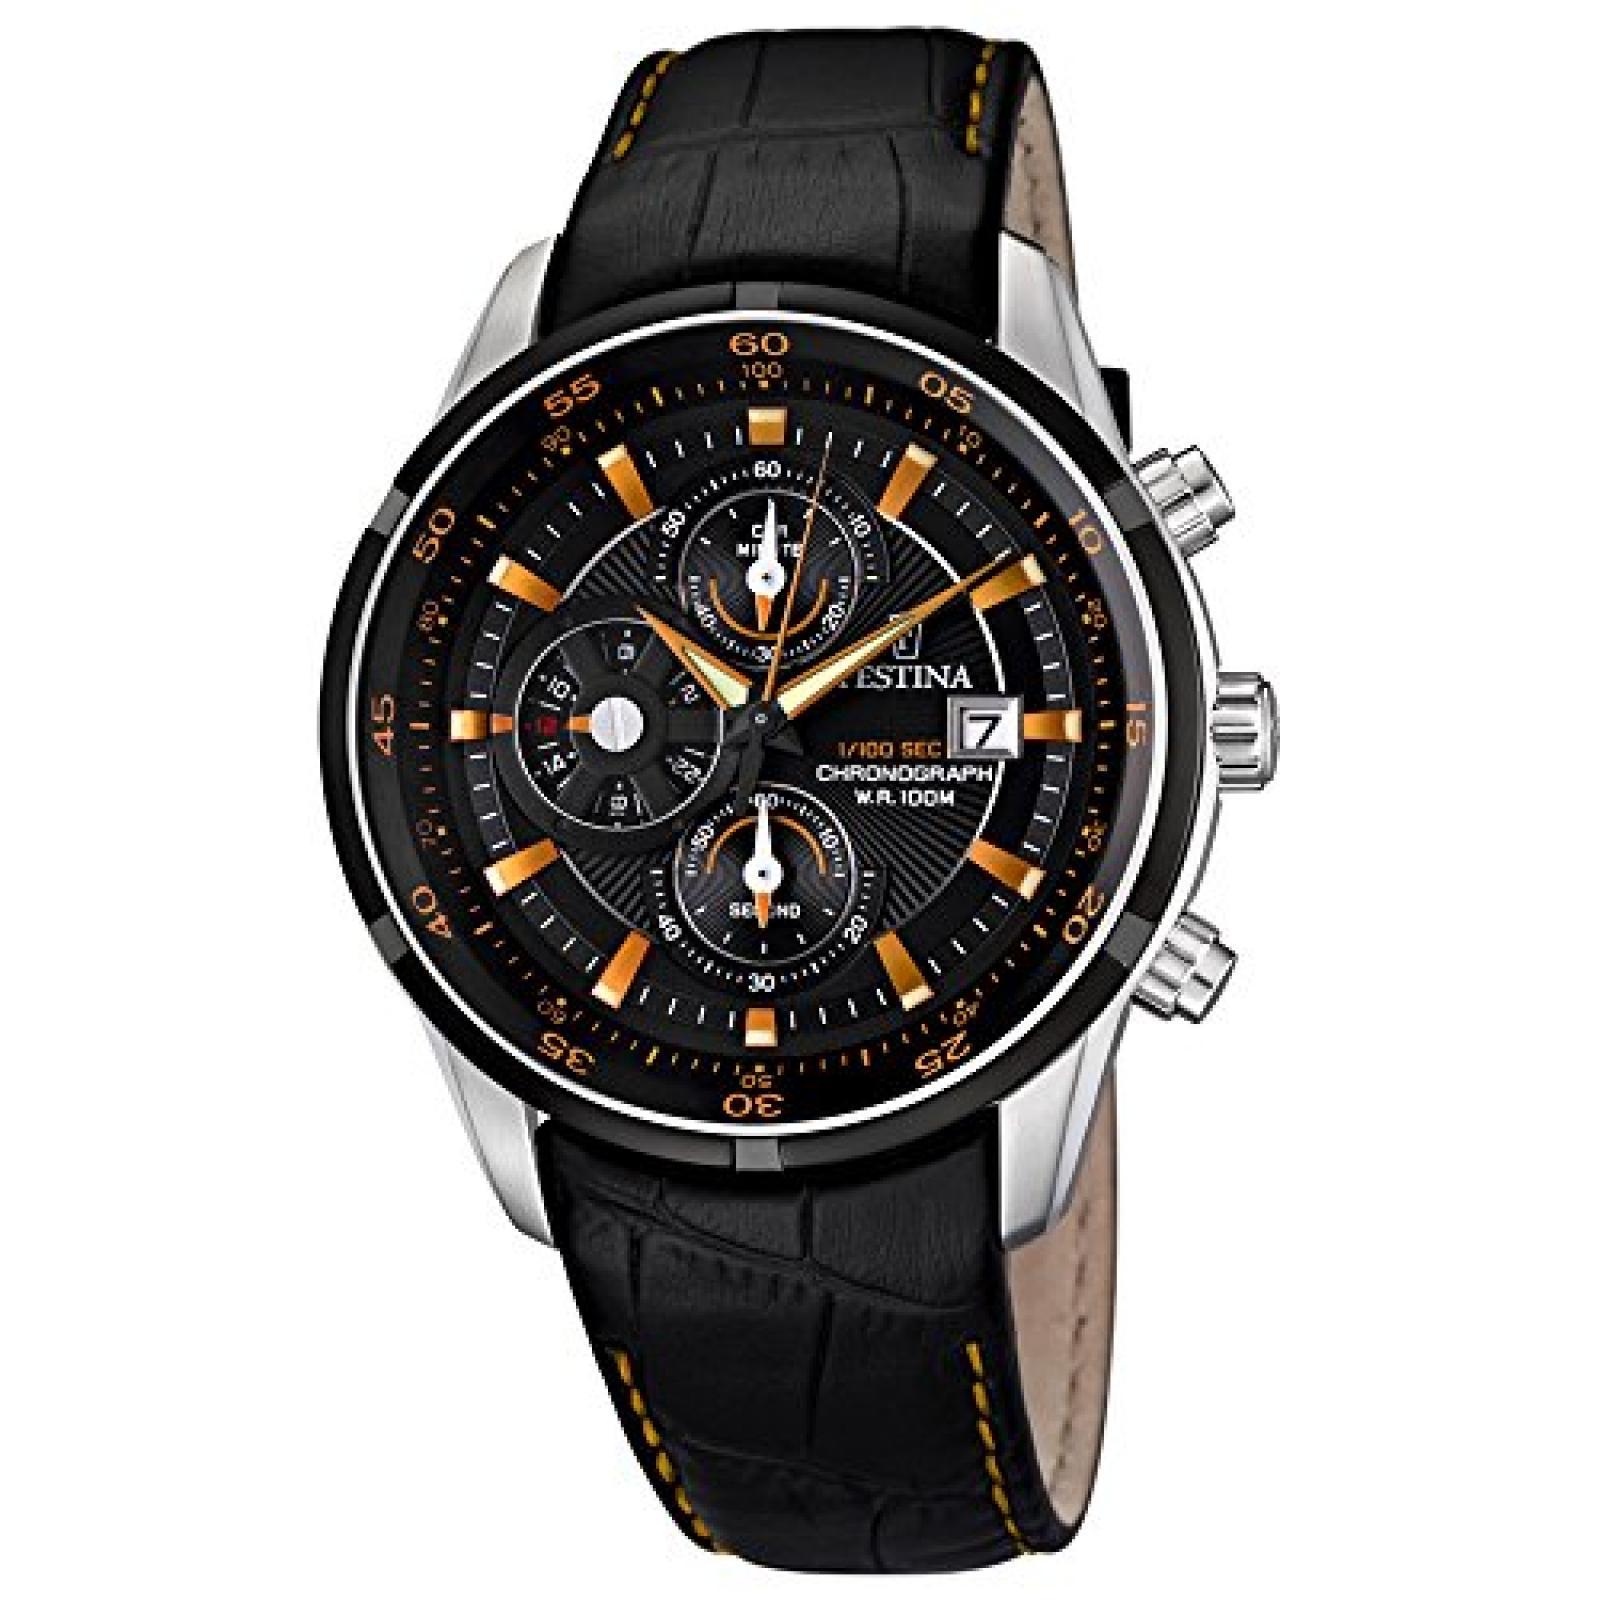 Festina Herren-Armbanduhr XL Analog Quarz Leder F6821/4